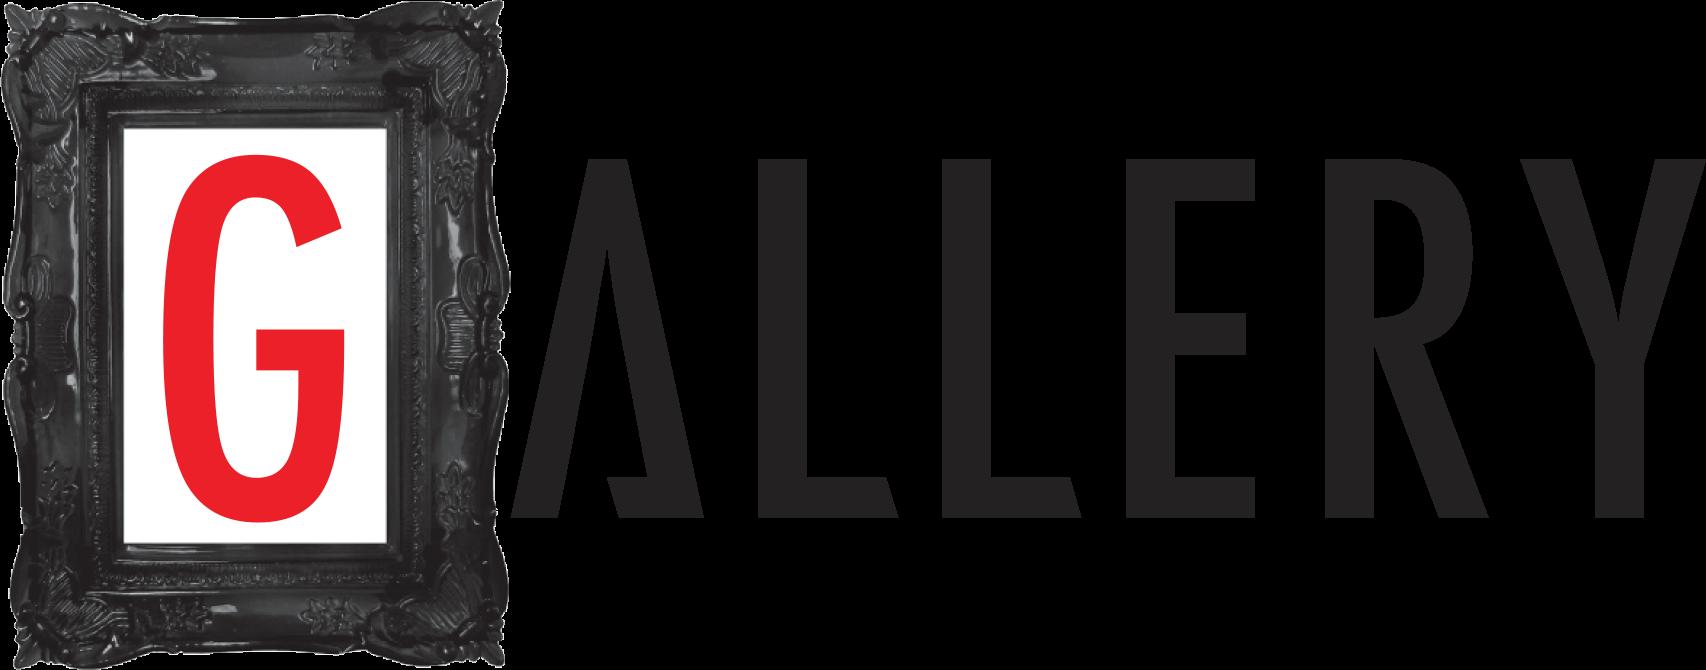 Gallery Vape